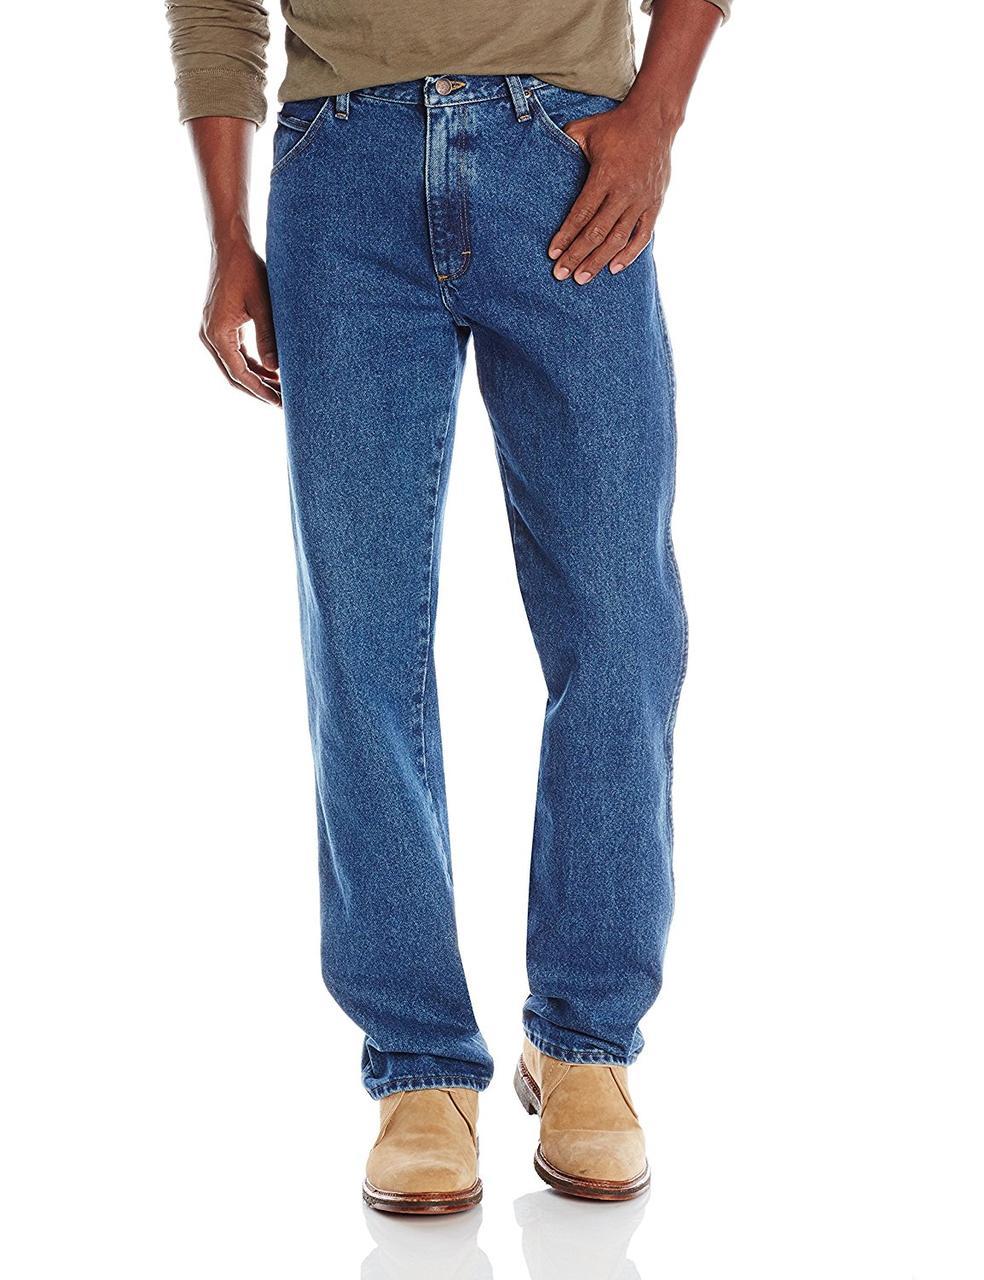 Джинсы Wrangler Regular Fit Straight Leg, Stonewash Mid, 36W34L, ZM100SW